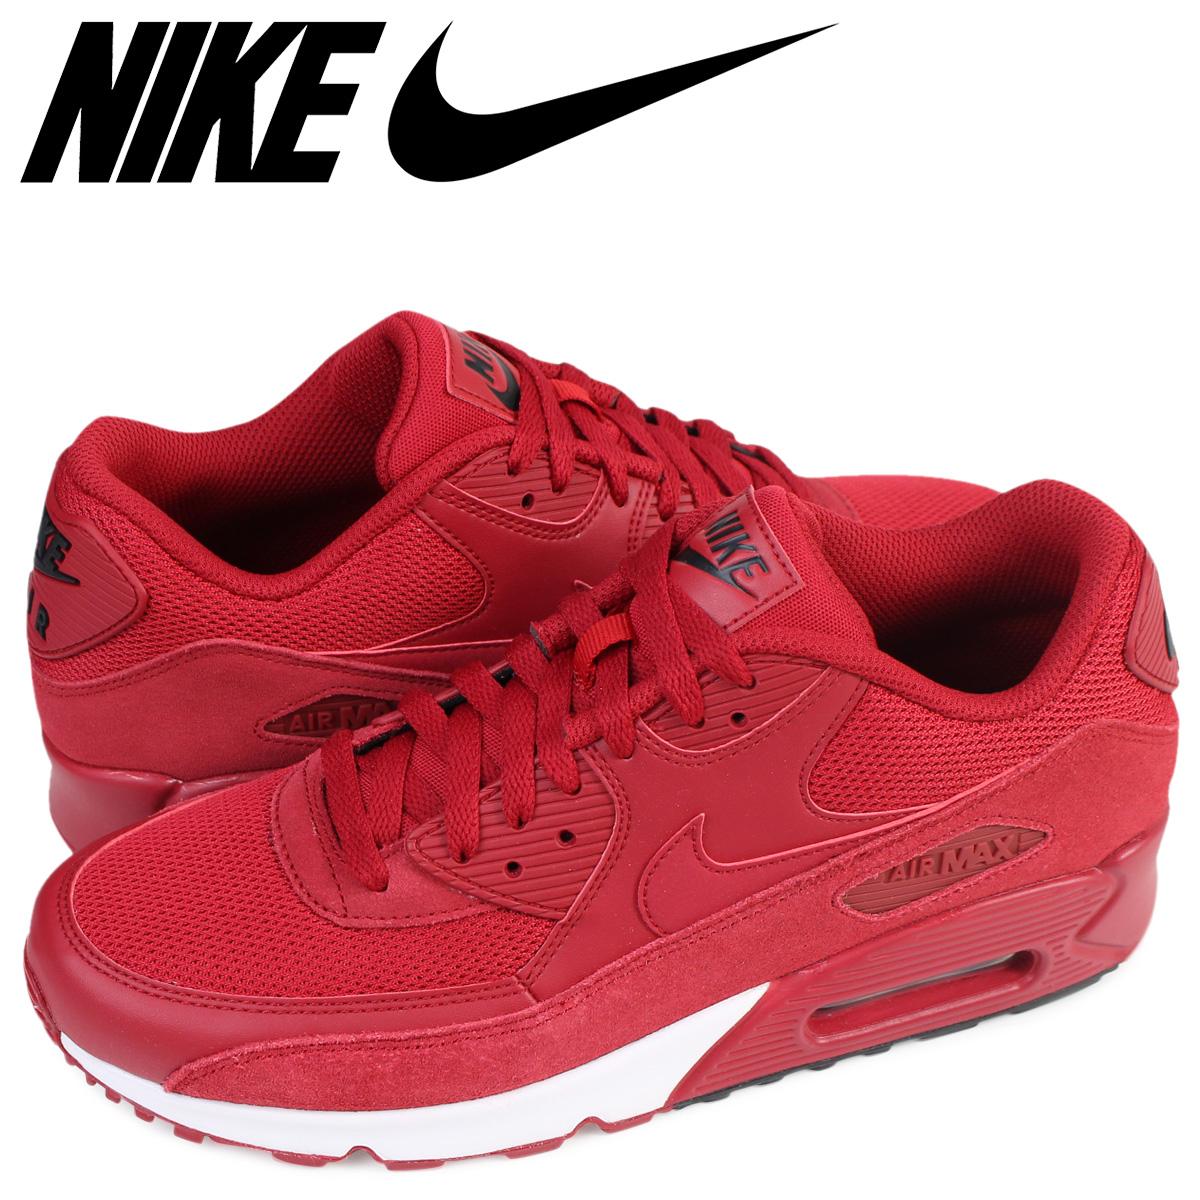 huge discount c7814 44a97 Nike NIKE Air Max men sneakers AIR MAX 90 ESSENTIAL 537,384-604 shoes red   6 21 Shinnyu load